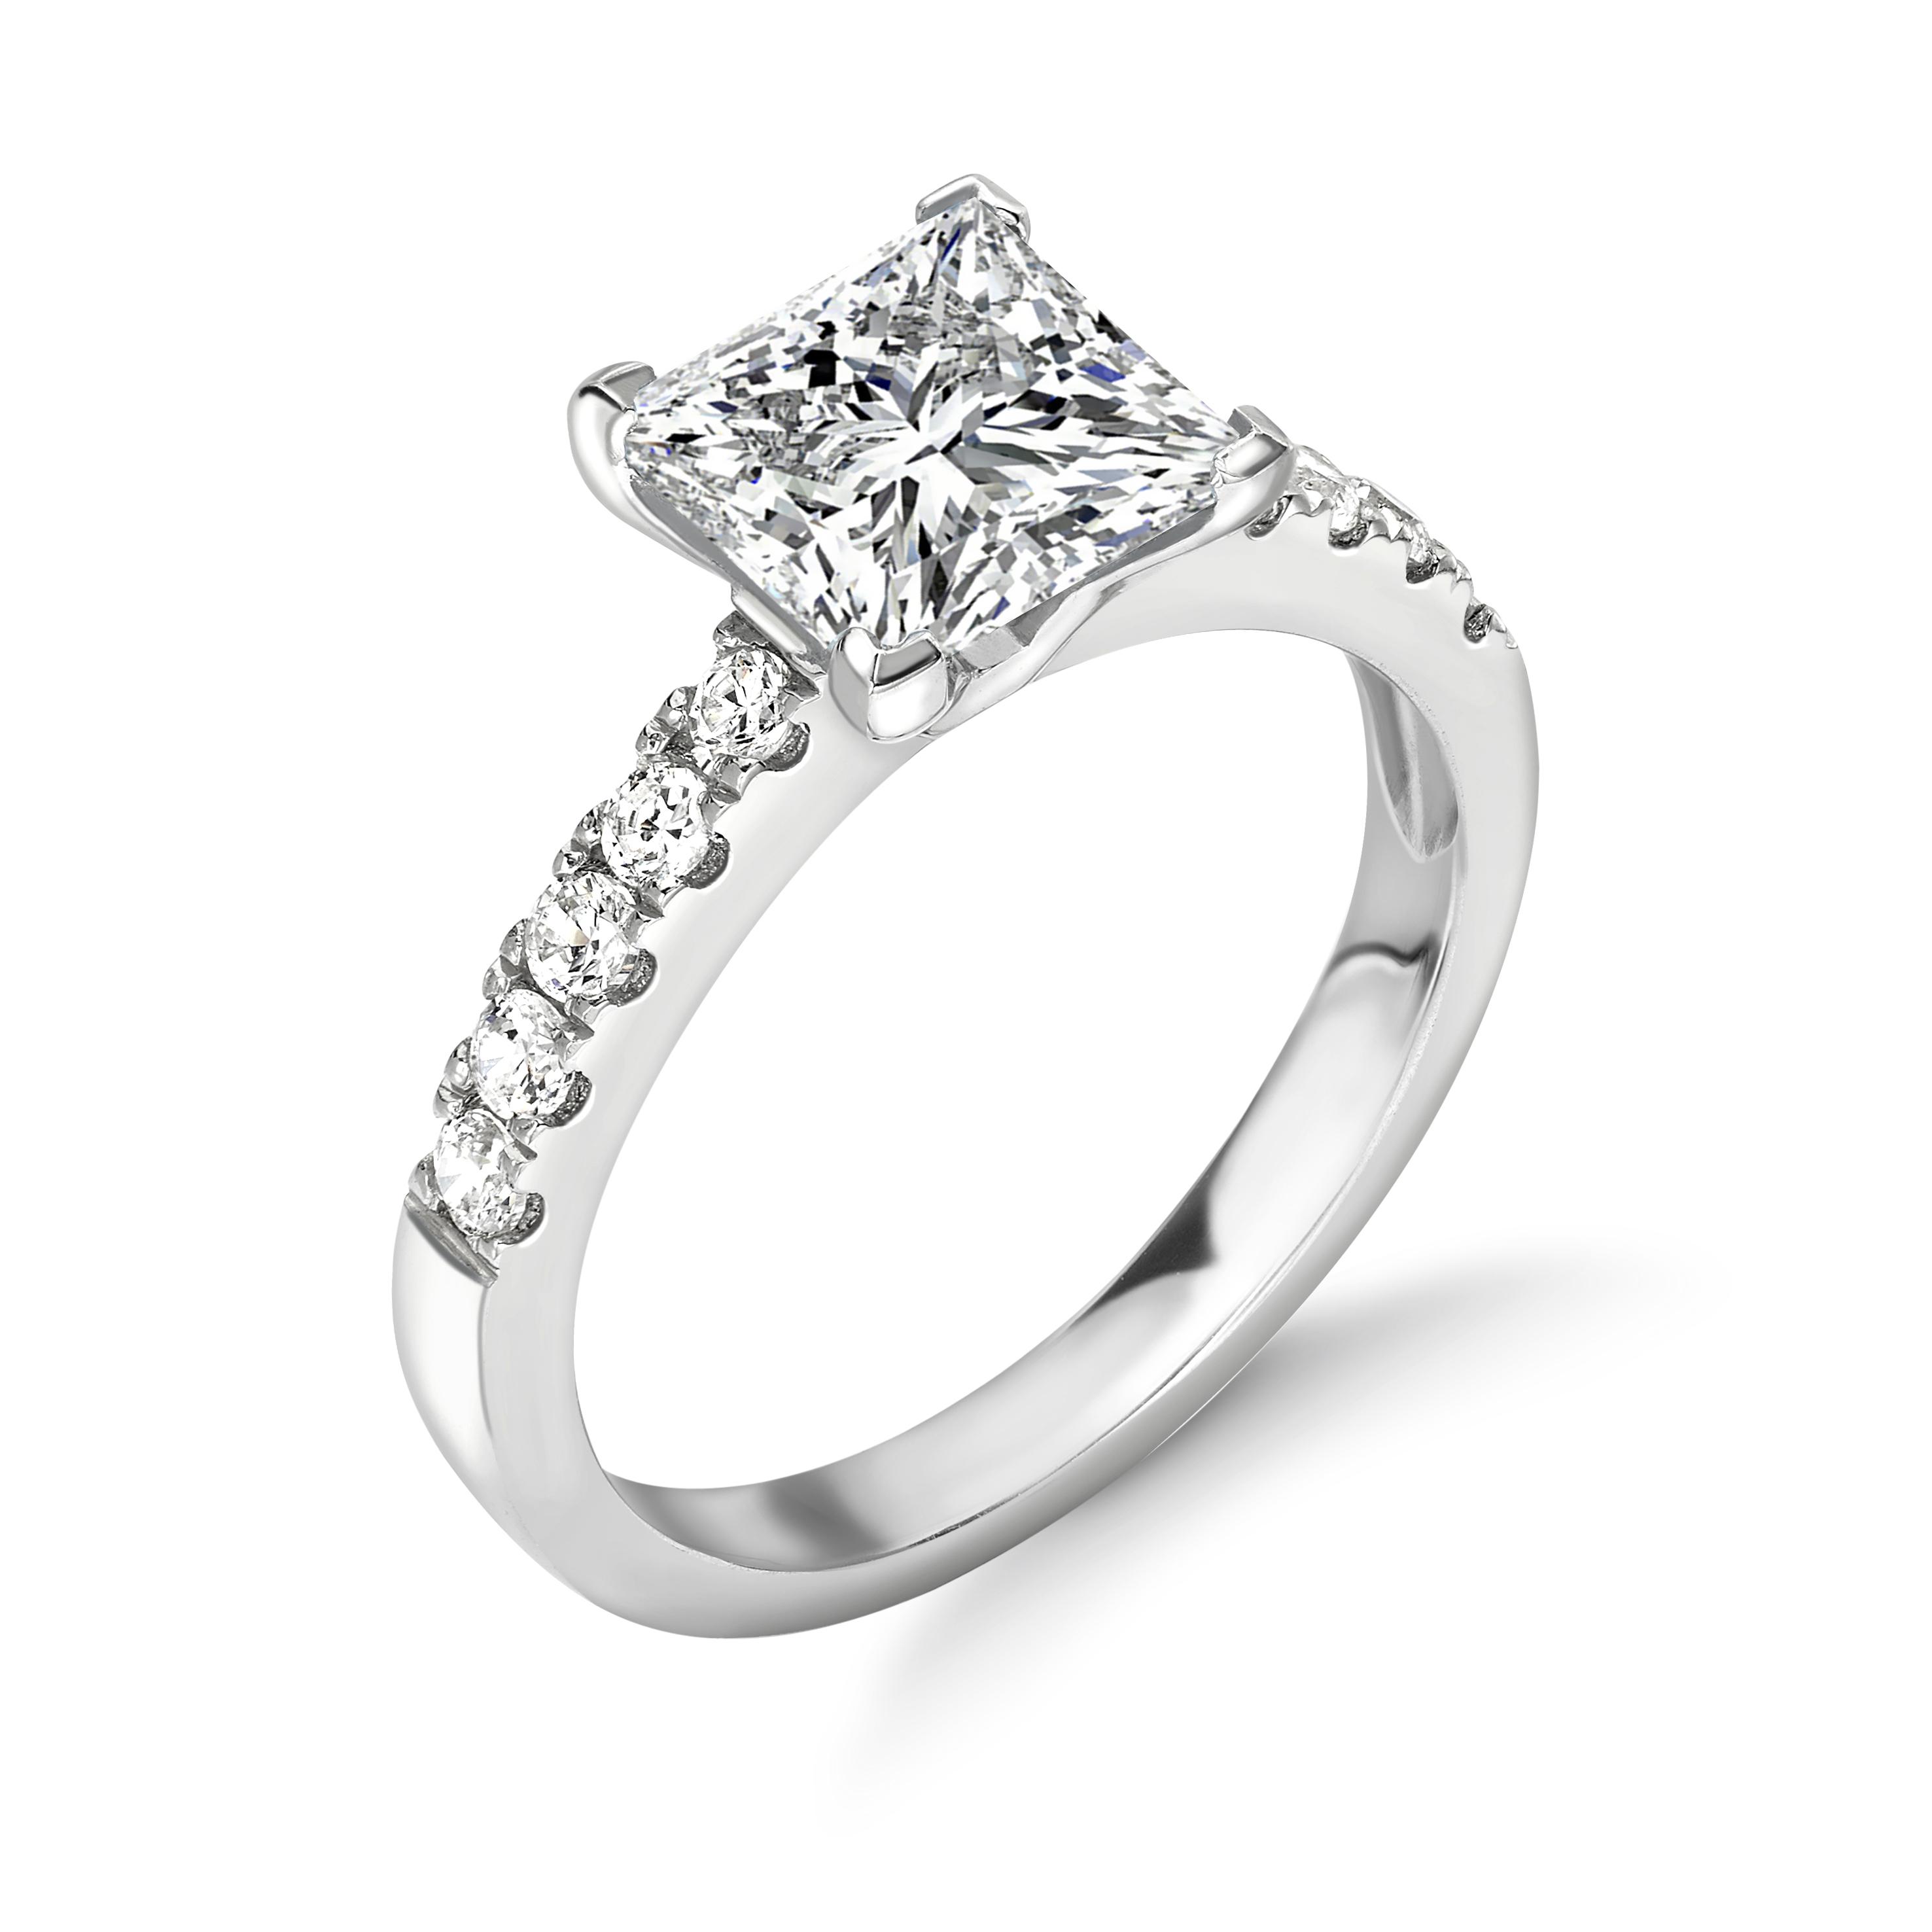 Princess Cut Square Diamond Side Stone Engagement Rings